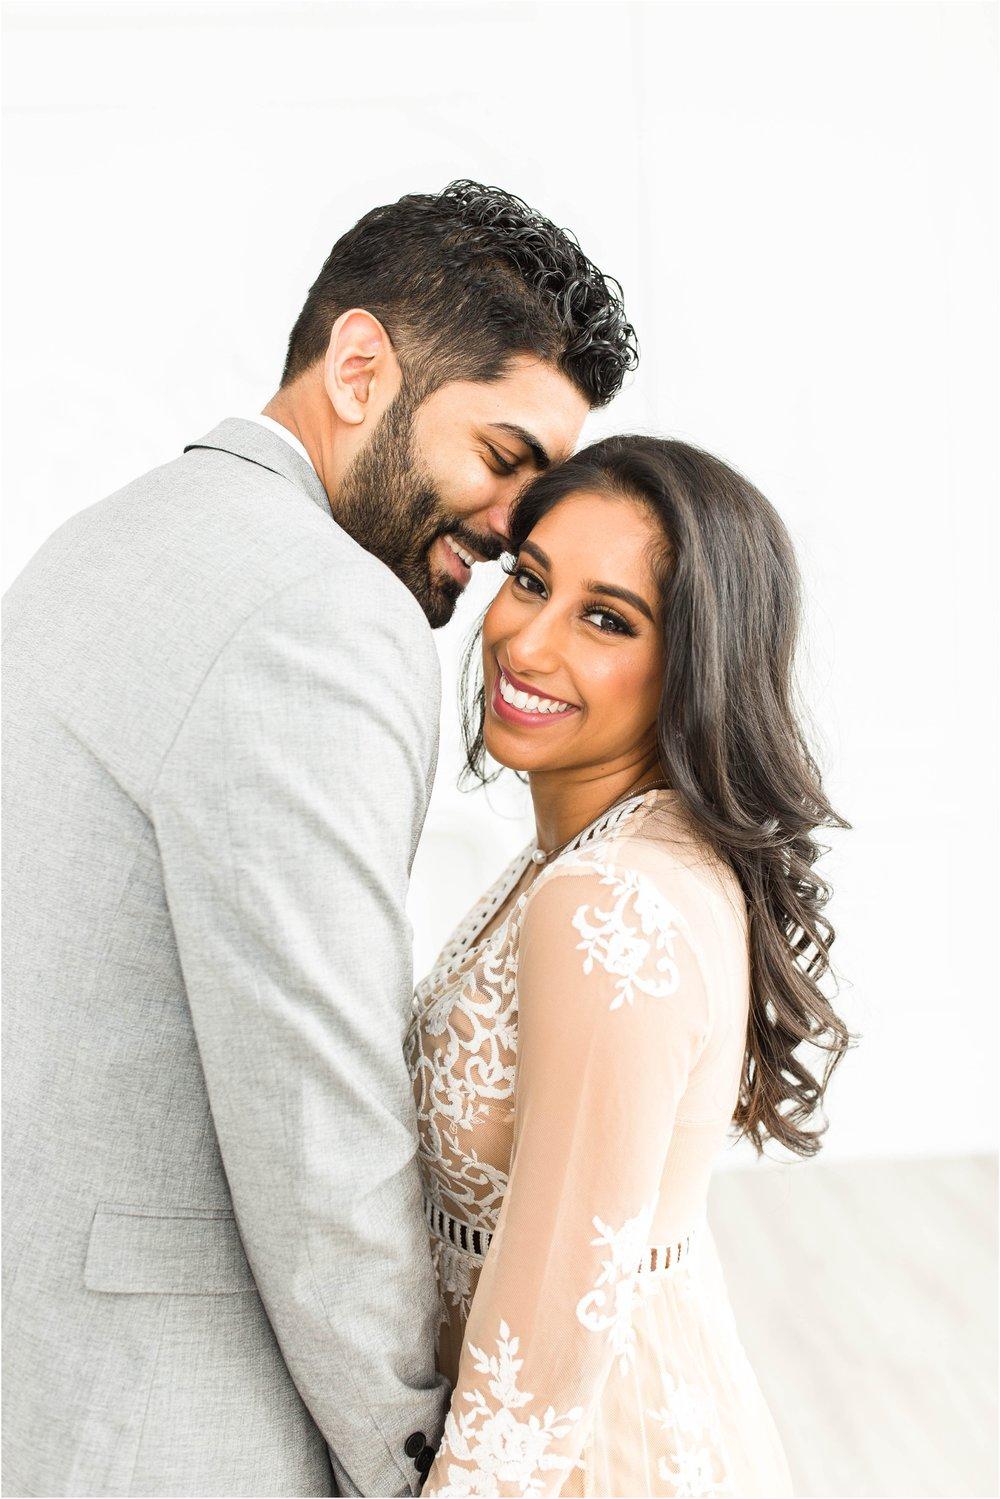 Mint-Room-Studios-Anniversary-Session-Toronto-Mississauga-Brampton-Scarborough-GTA-Pakistani-Indian-Wedding-Engagement-Photographer-Photography_0005.jpg